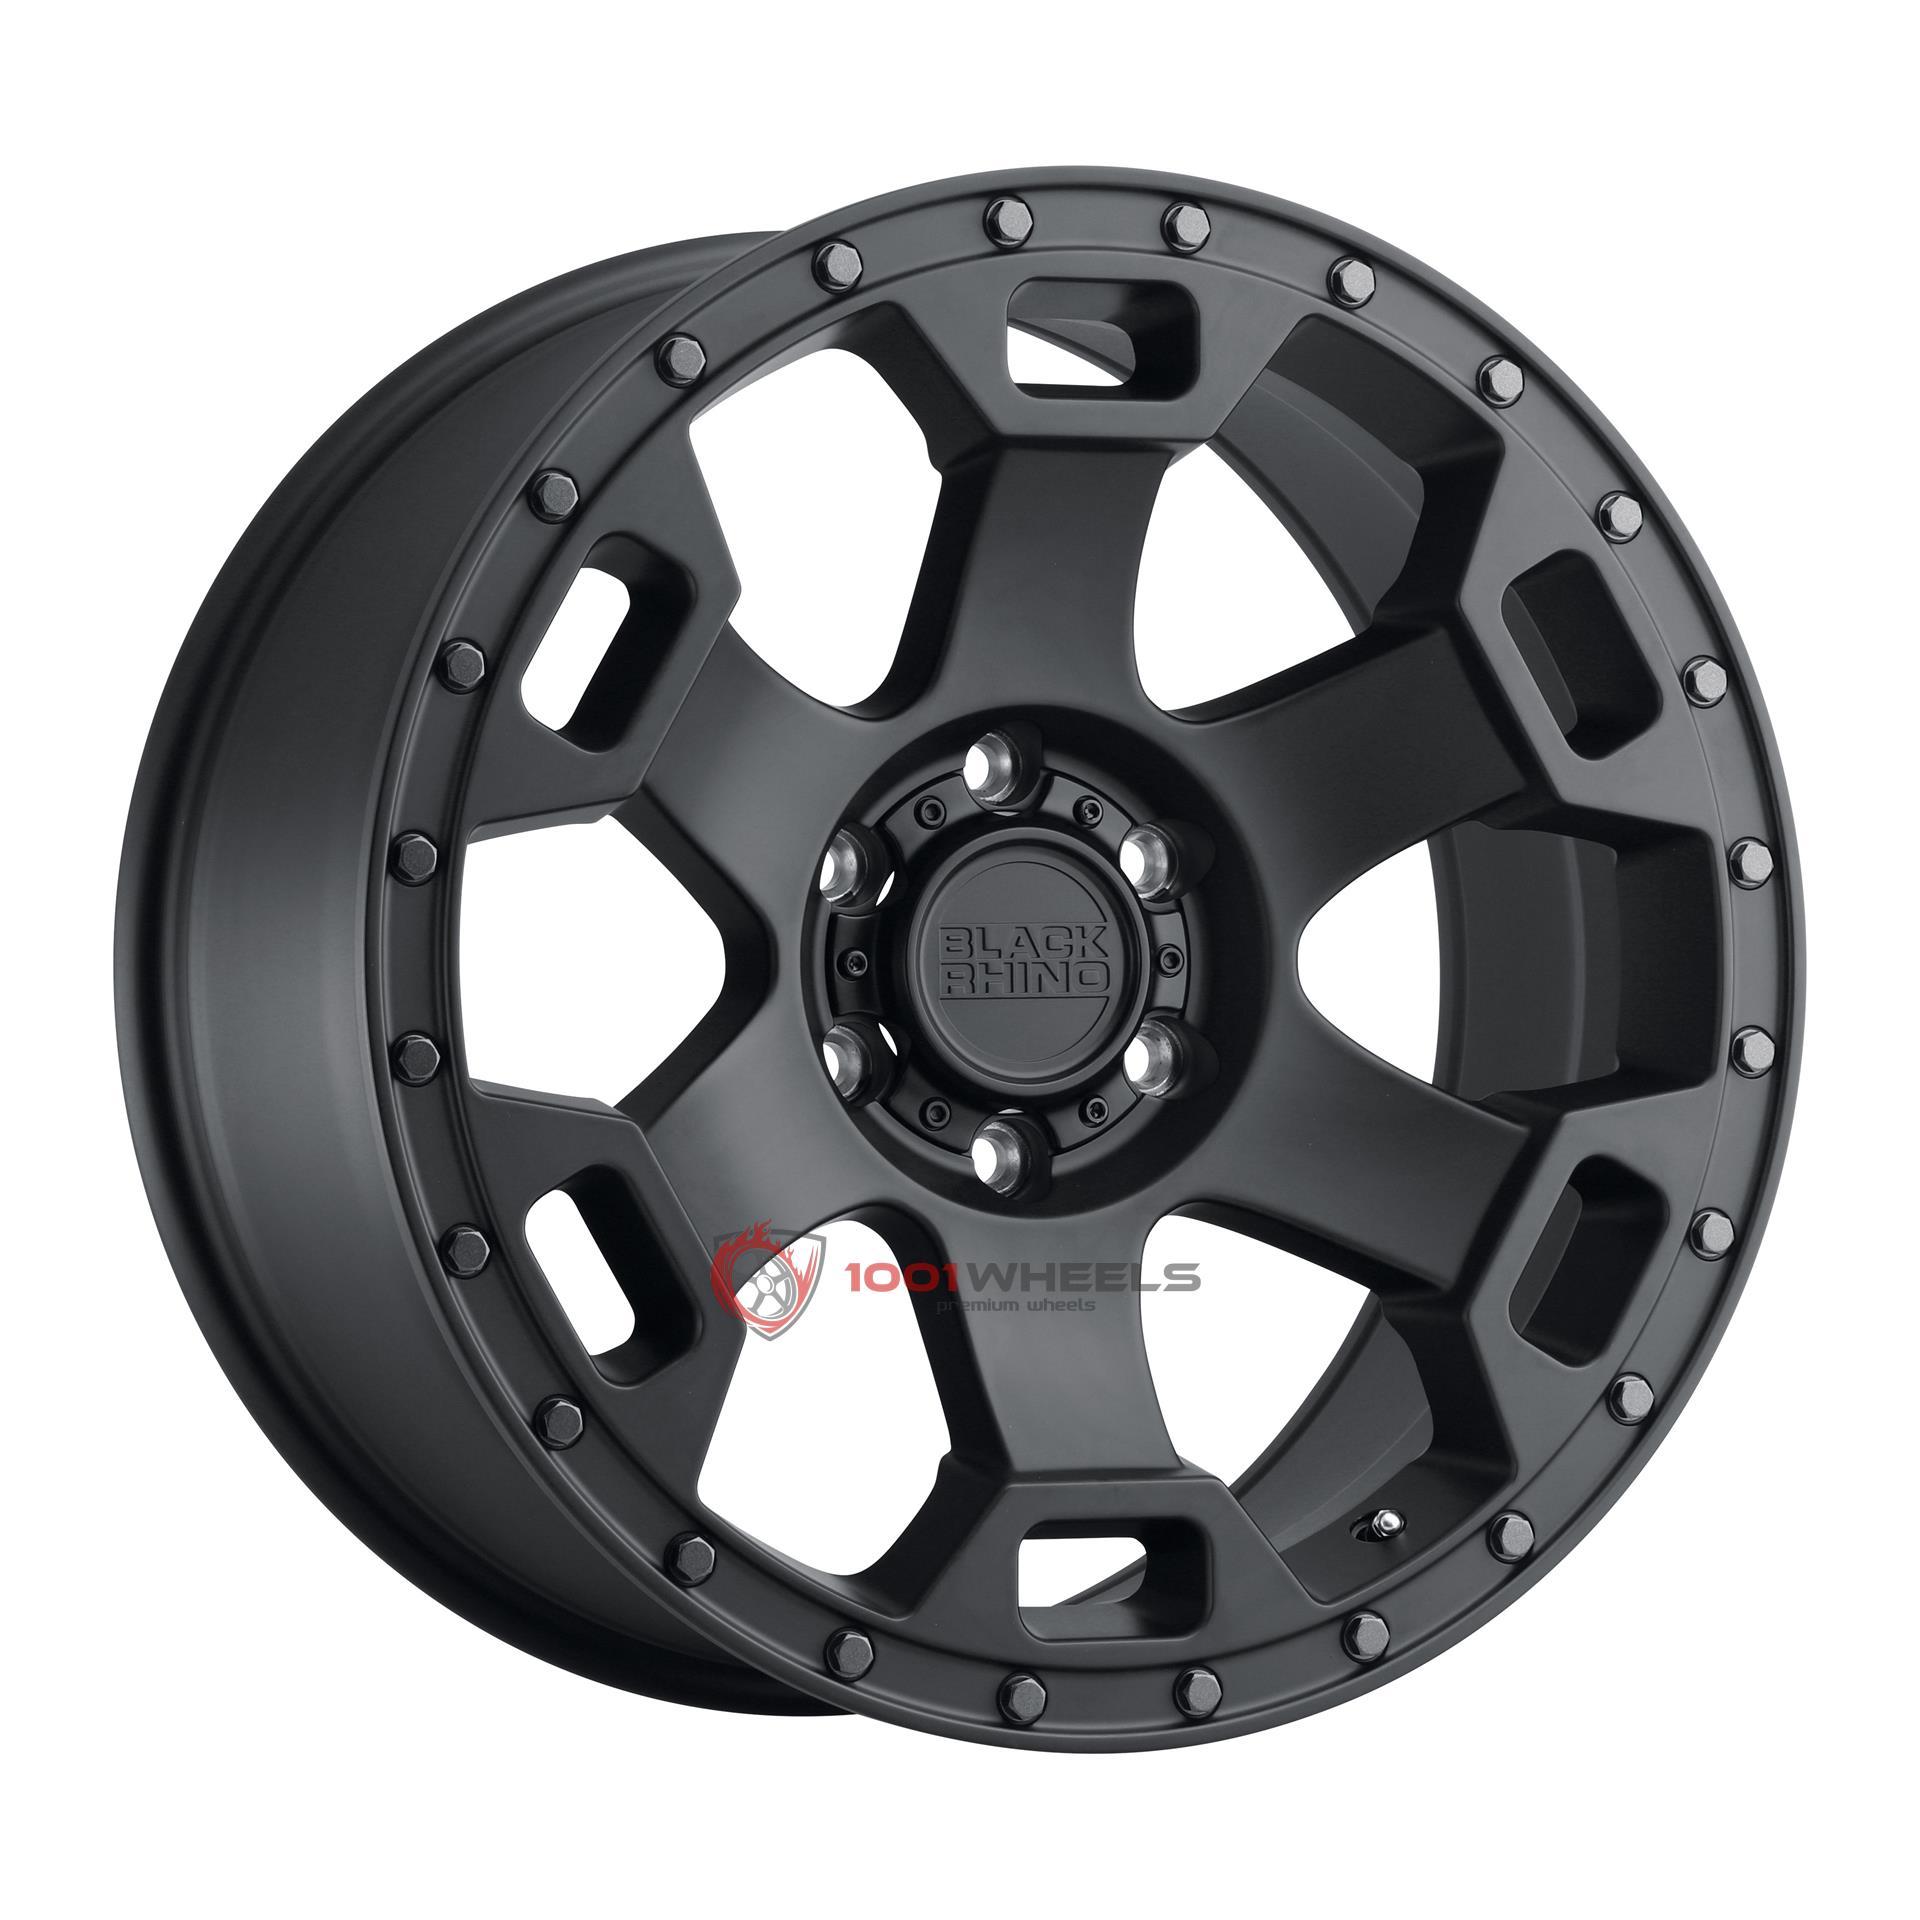 BLACK RHINO GAUNTLET semi-gloss-black-wgunmetal-bolt